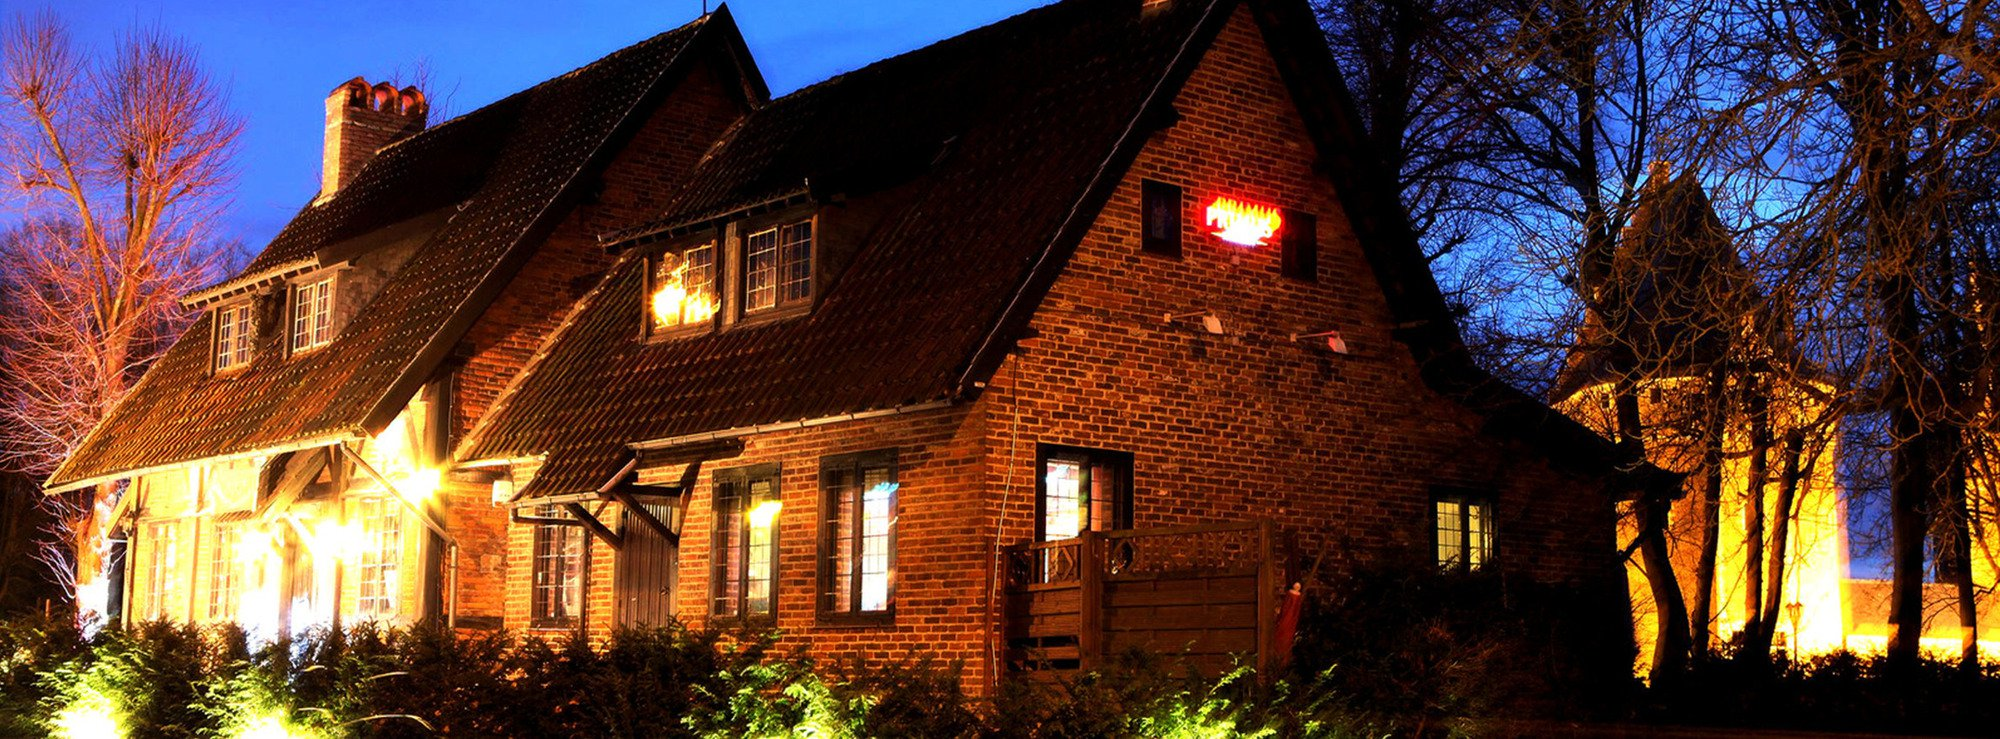 Brasserie Kasteel Beersel - Brasserie – Restaurant -nl